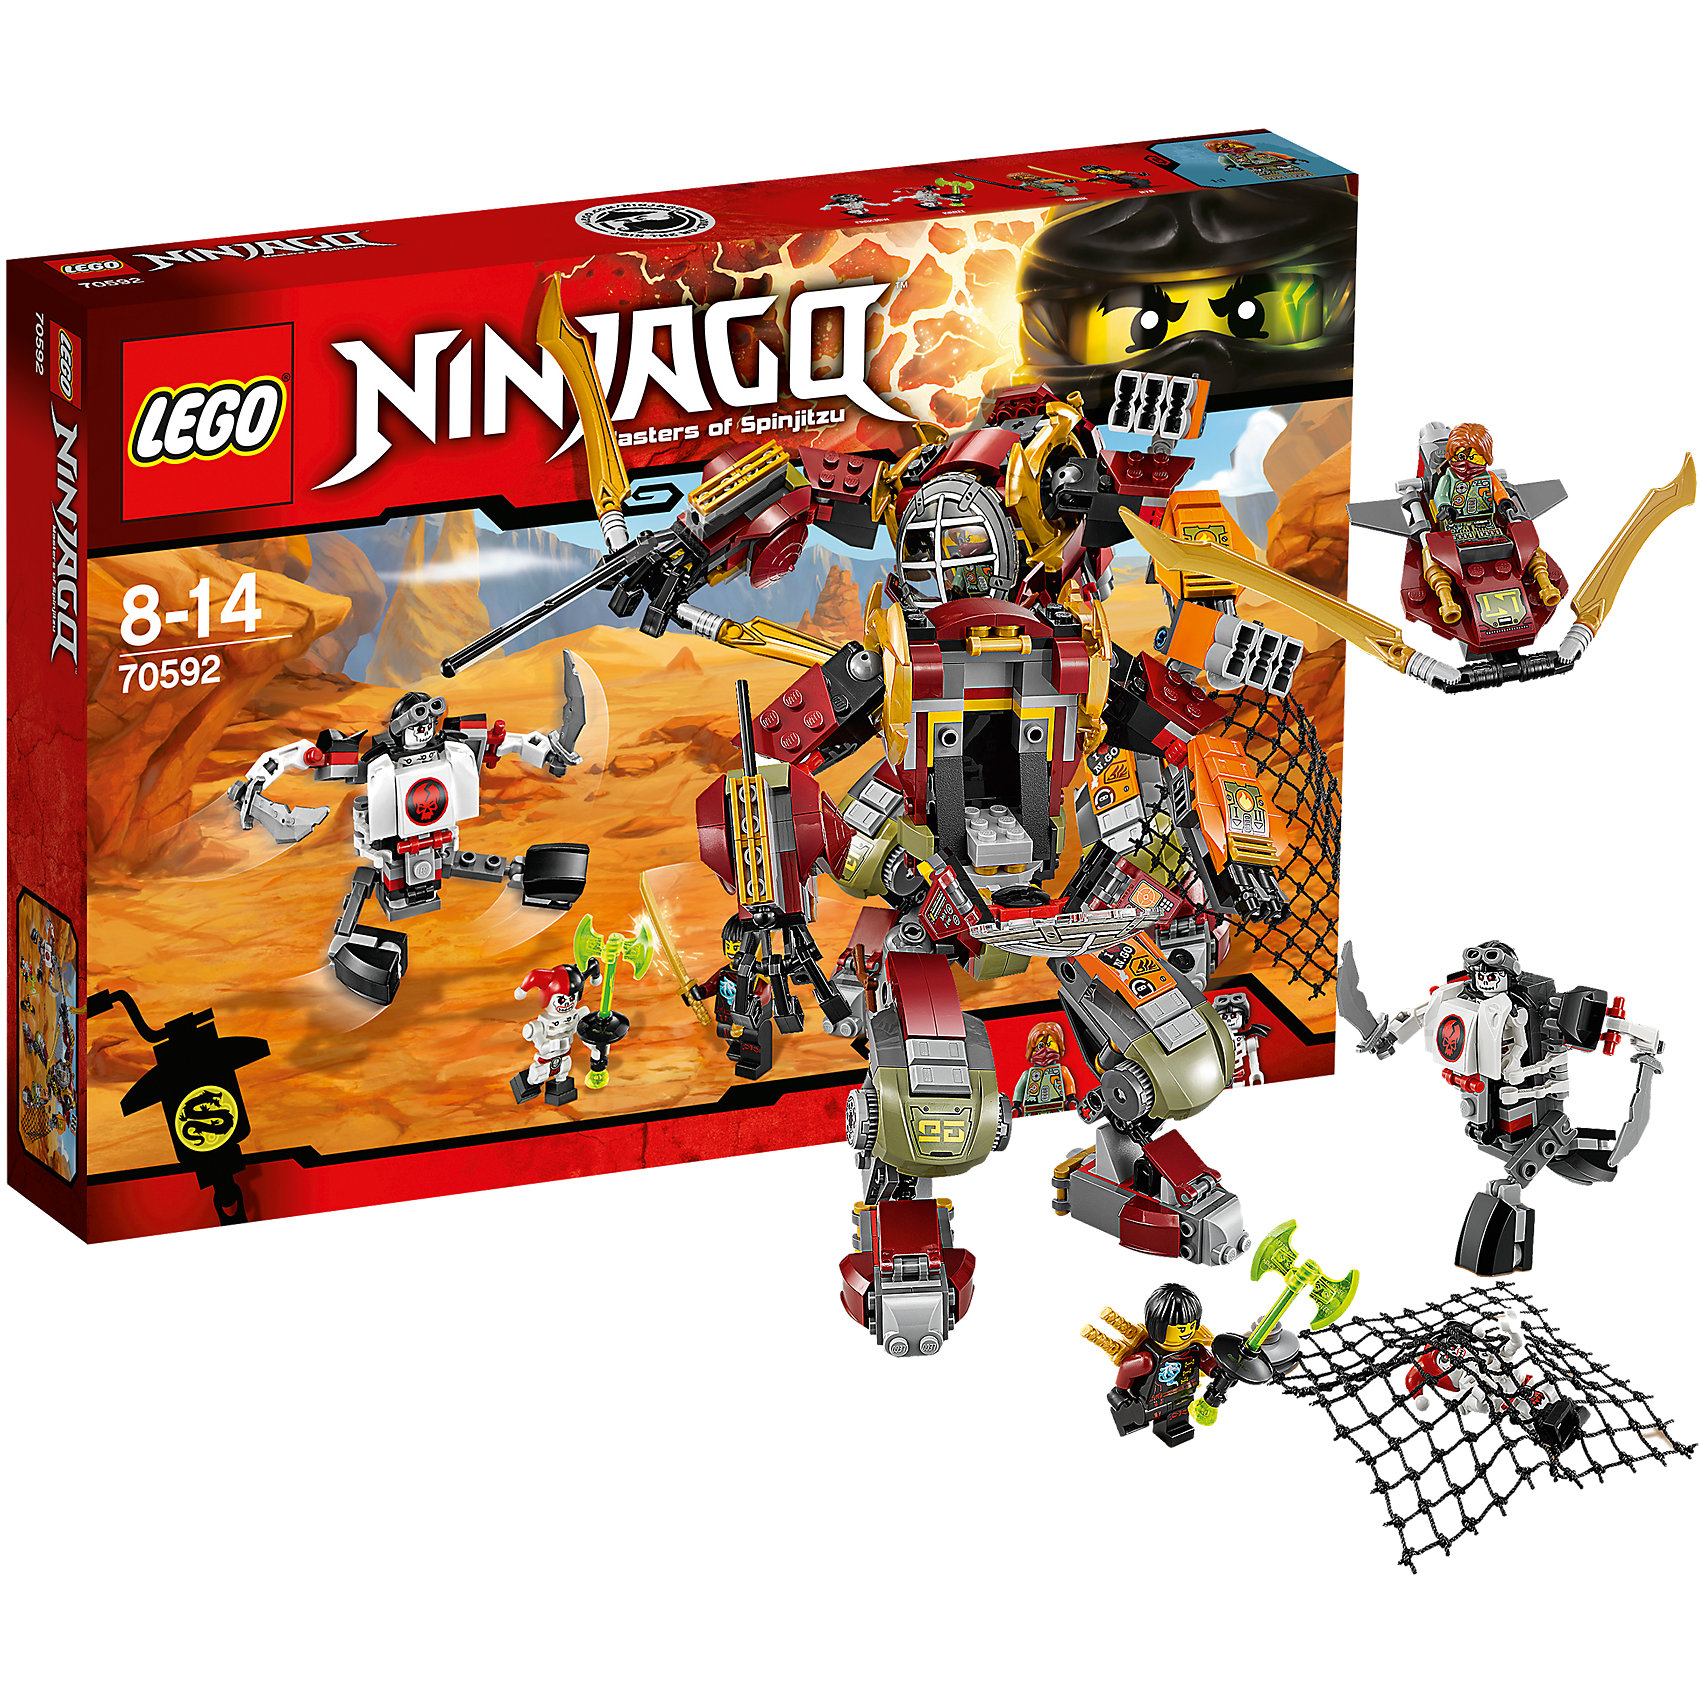 LEGO LEGO NINJAGO 70592: Робот-спасатель